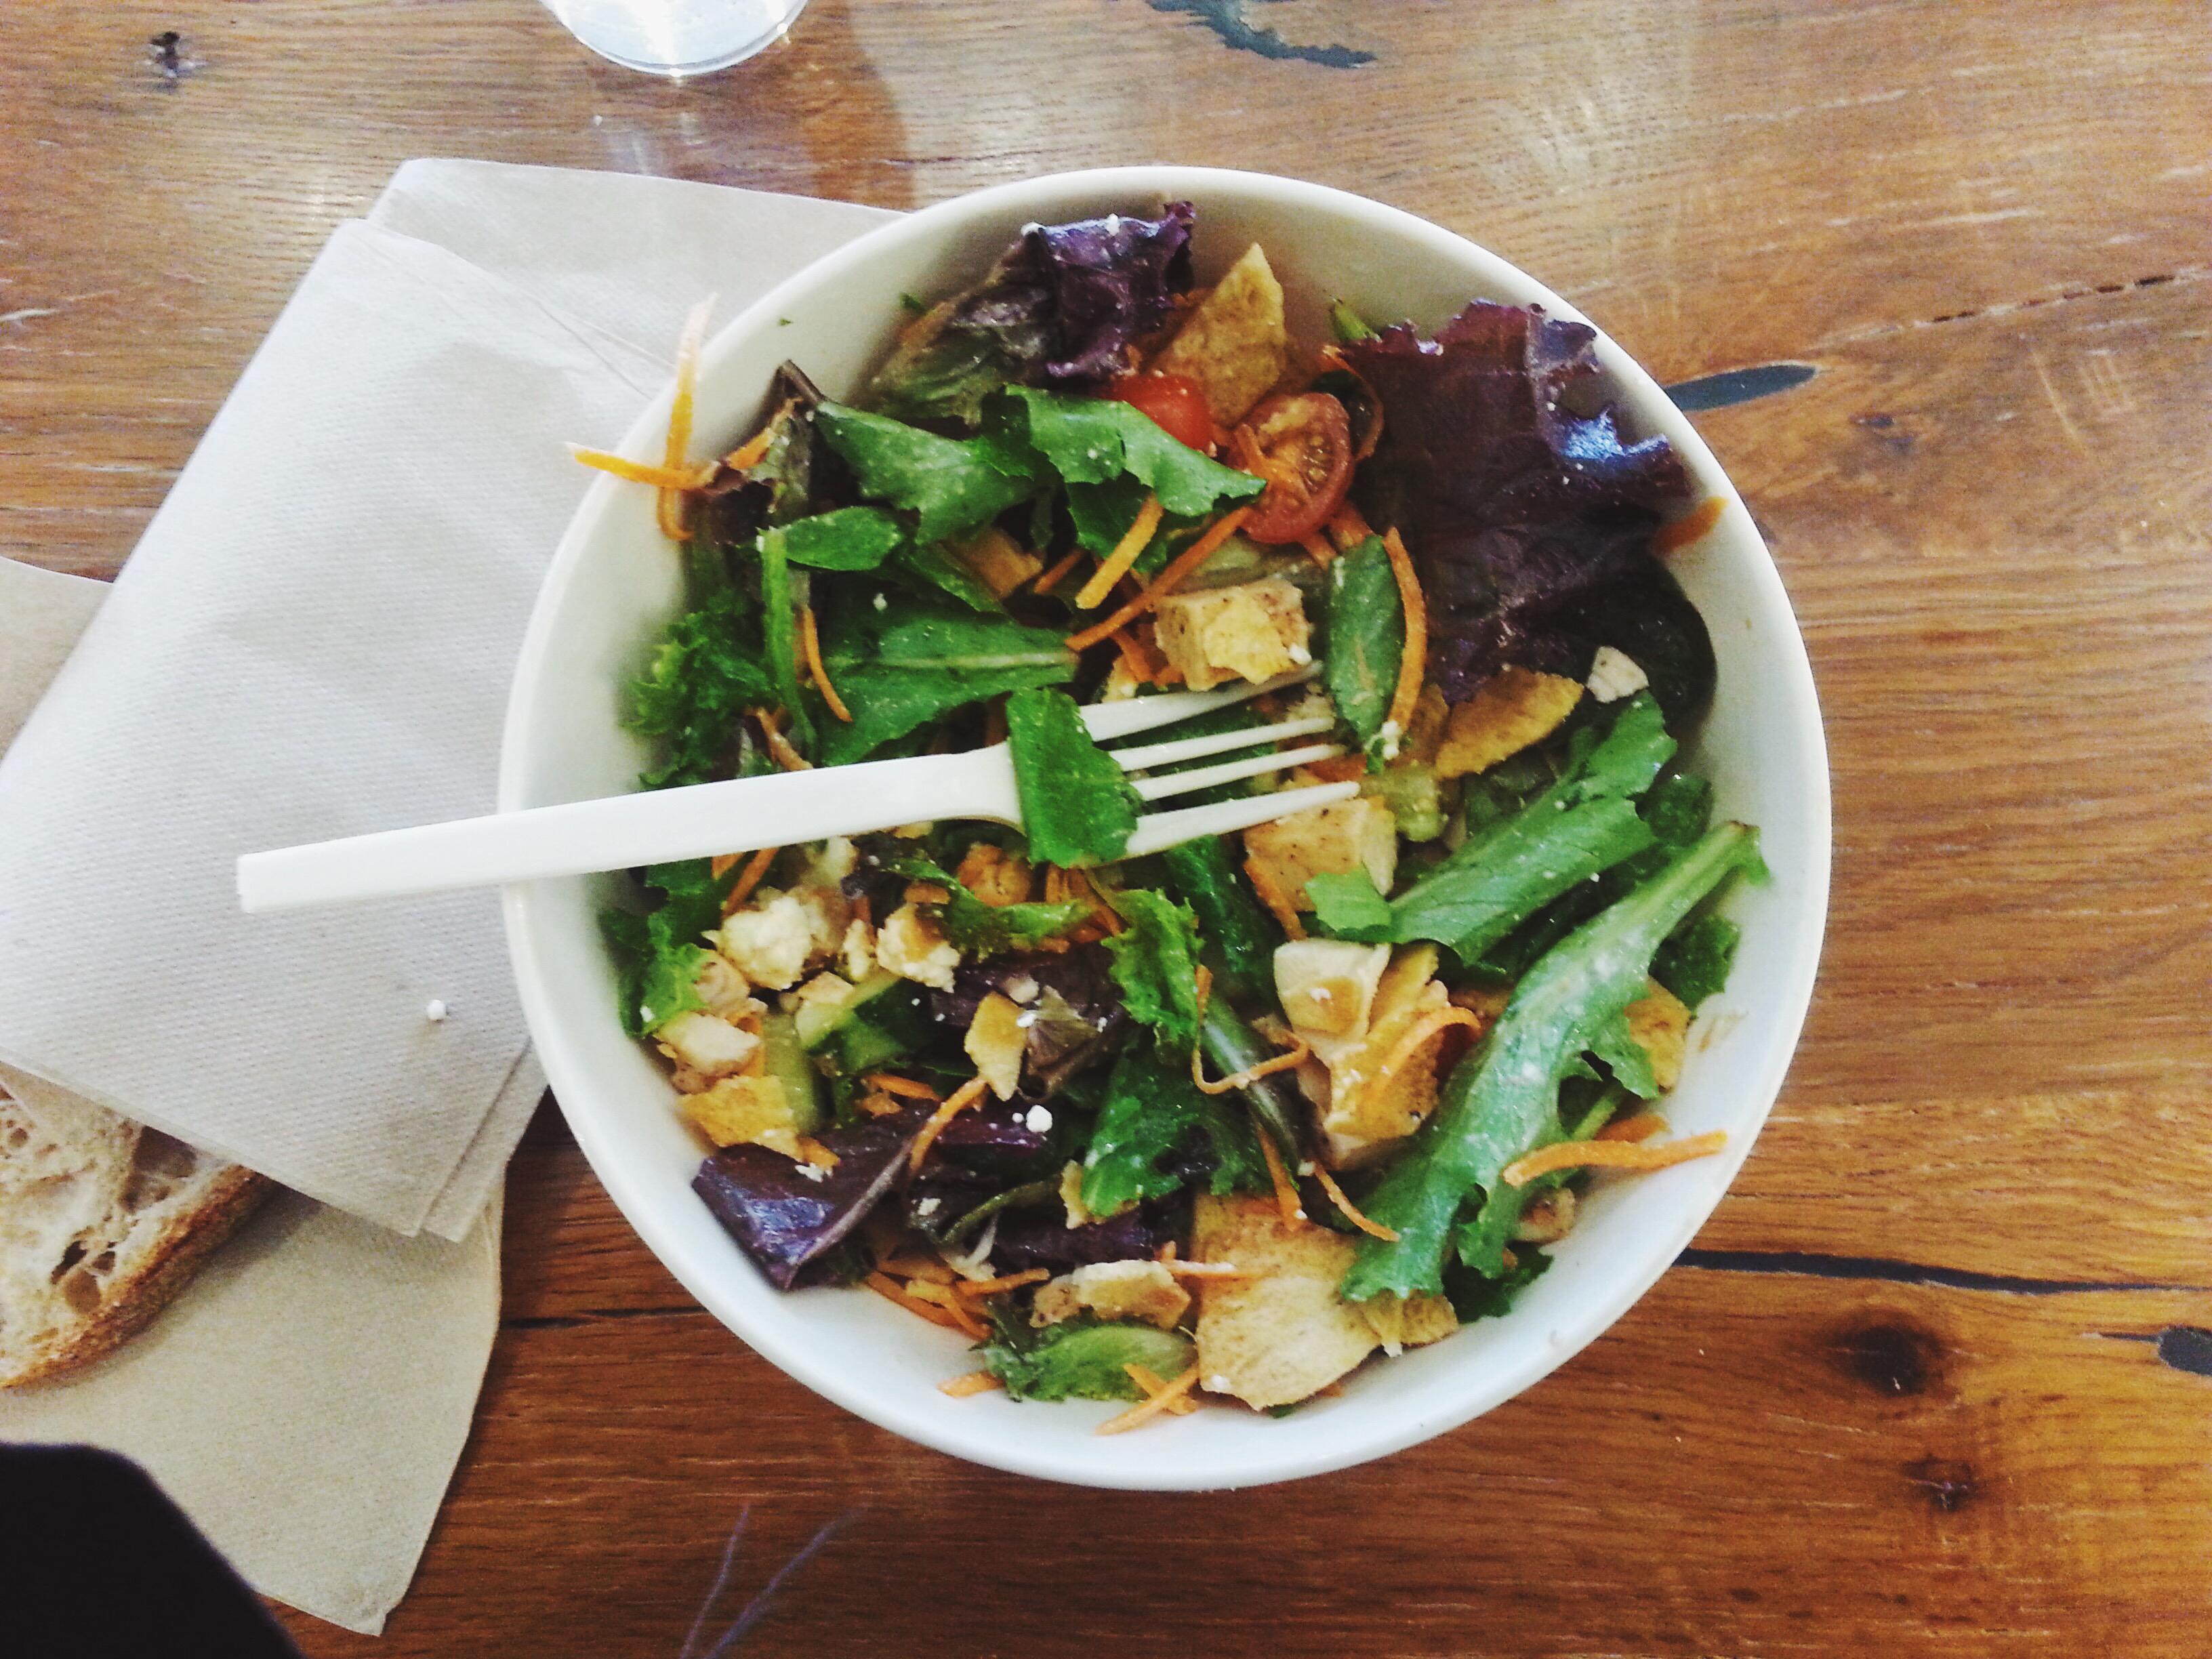 Салат из фасоли и риса 20 фотография